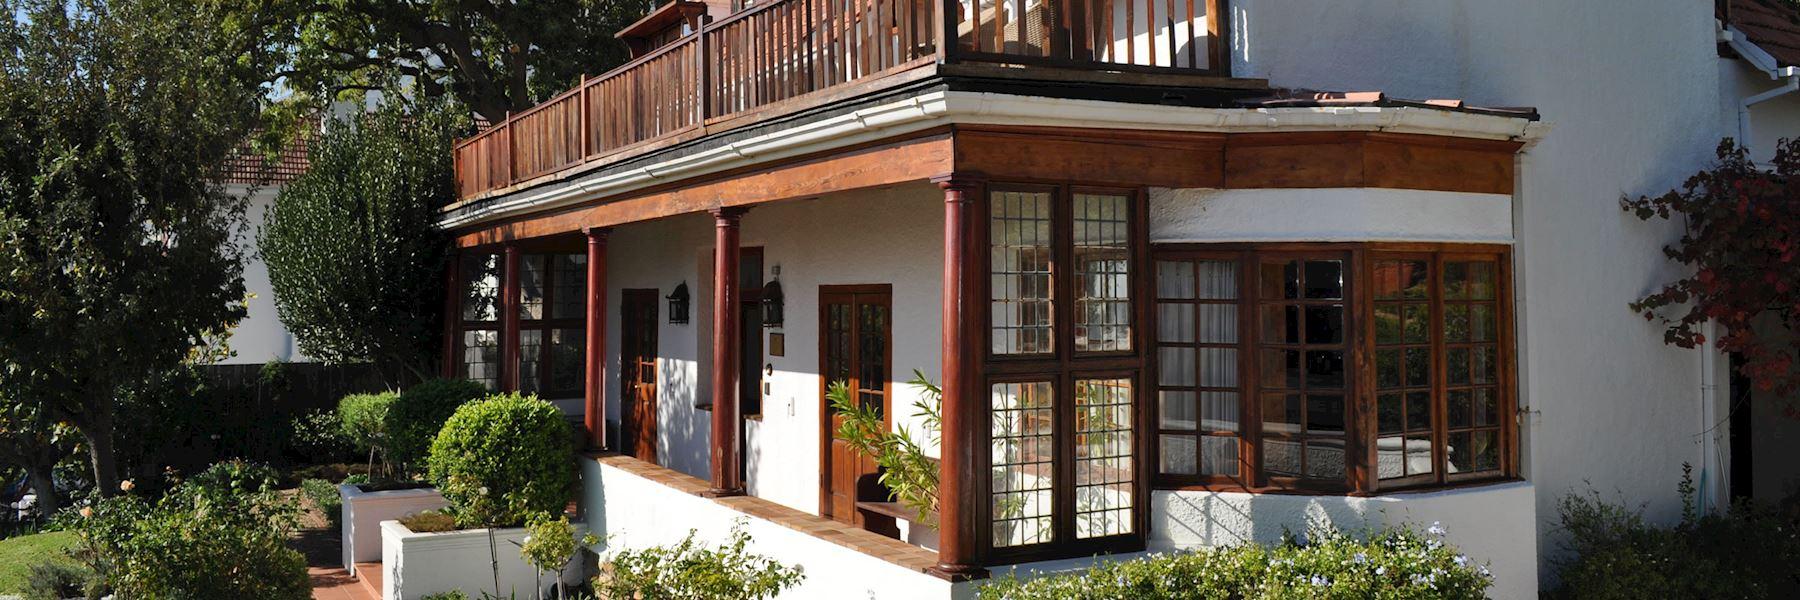 Acorn House